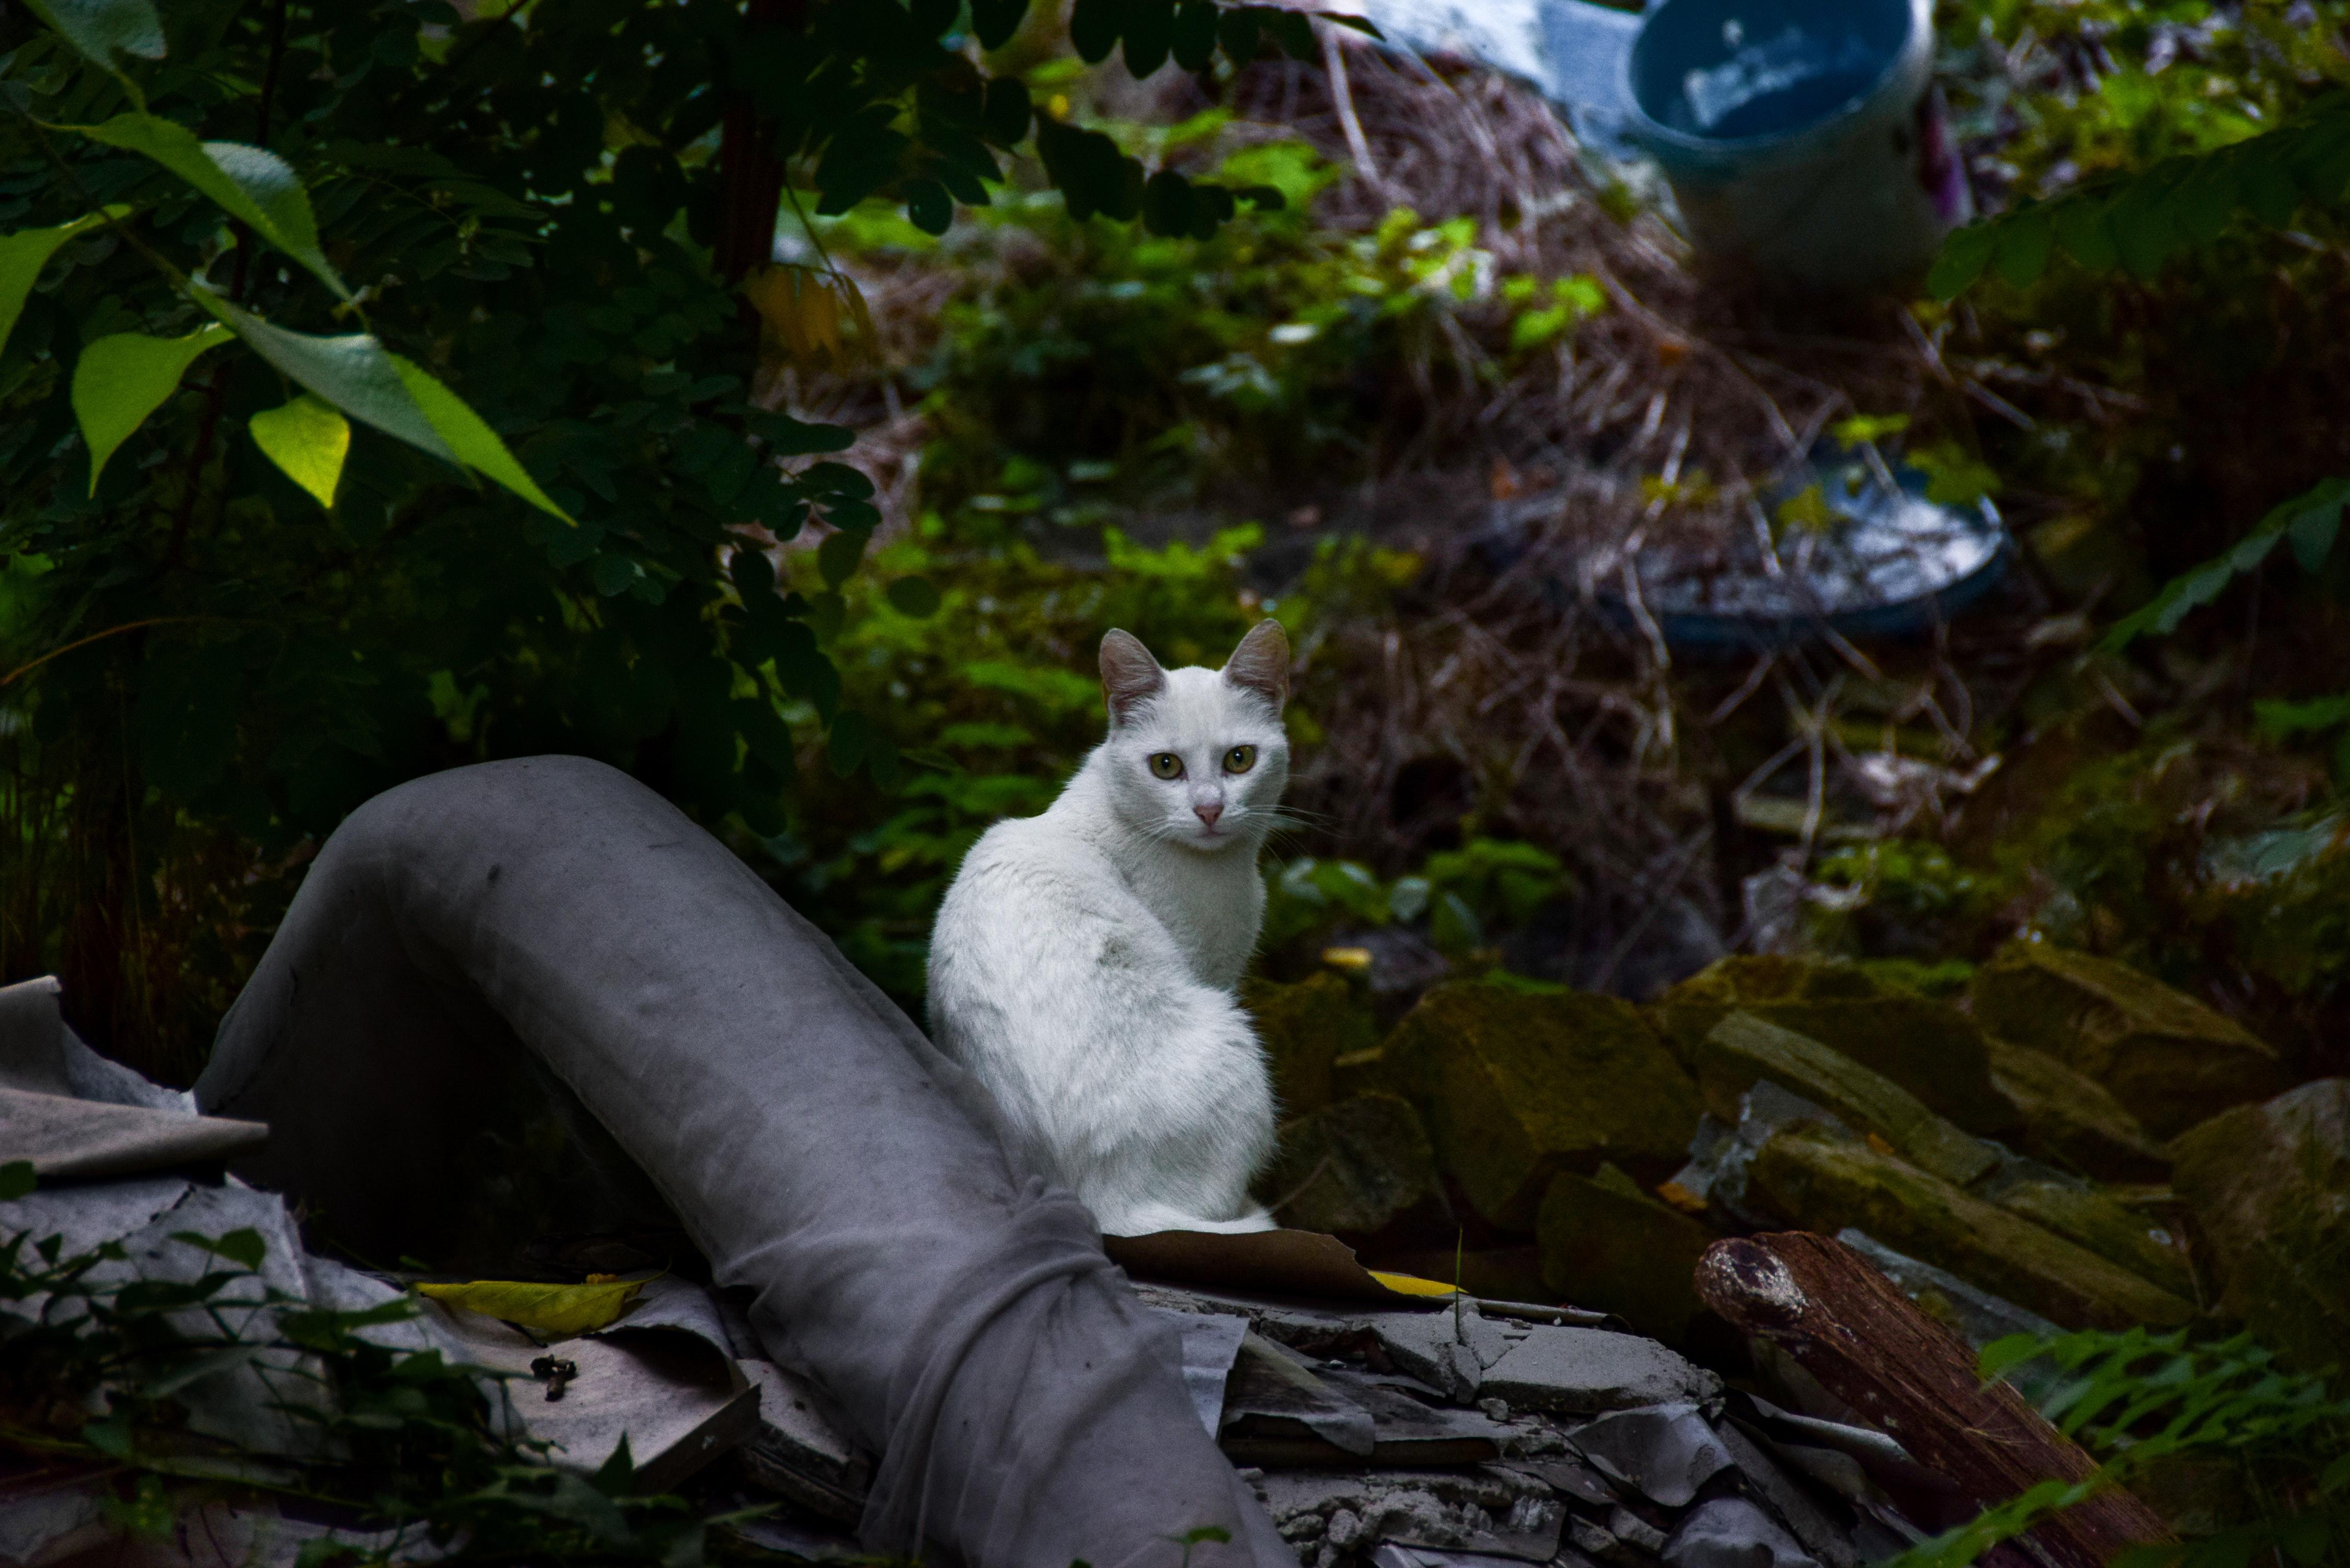 White Short Fur Cat, Animal, Cat, Daylight, Domestic animal, HQ Photo